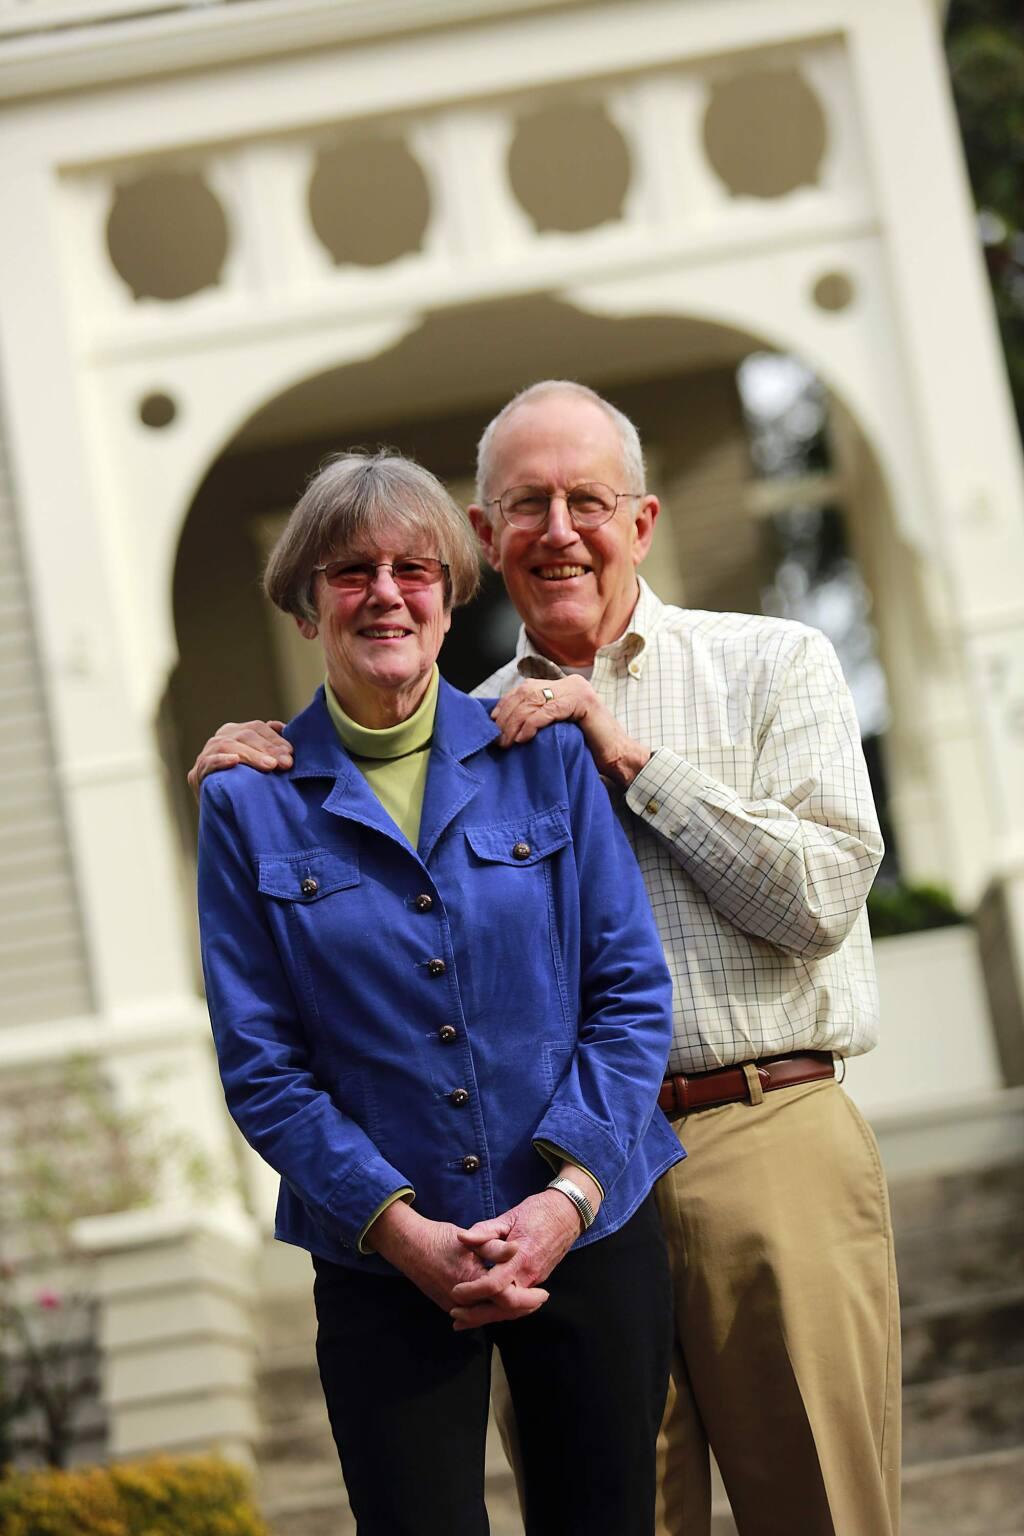 Harry and Dee Richardson donate to the Santa Rosa Community Foundation. (JOHN BURGESS / The Press Democrat)